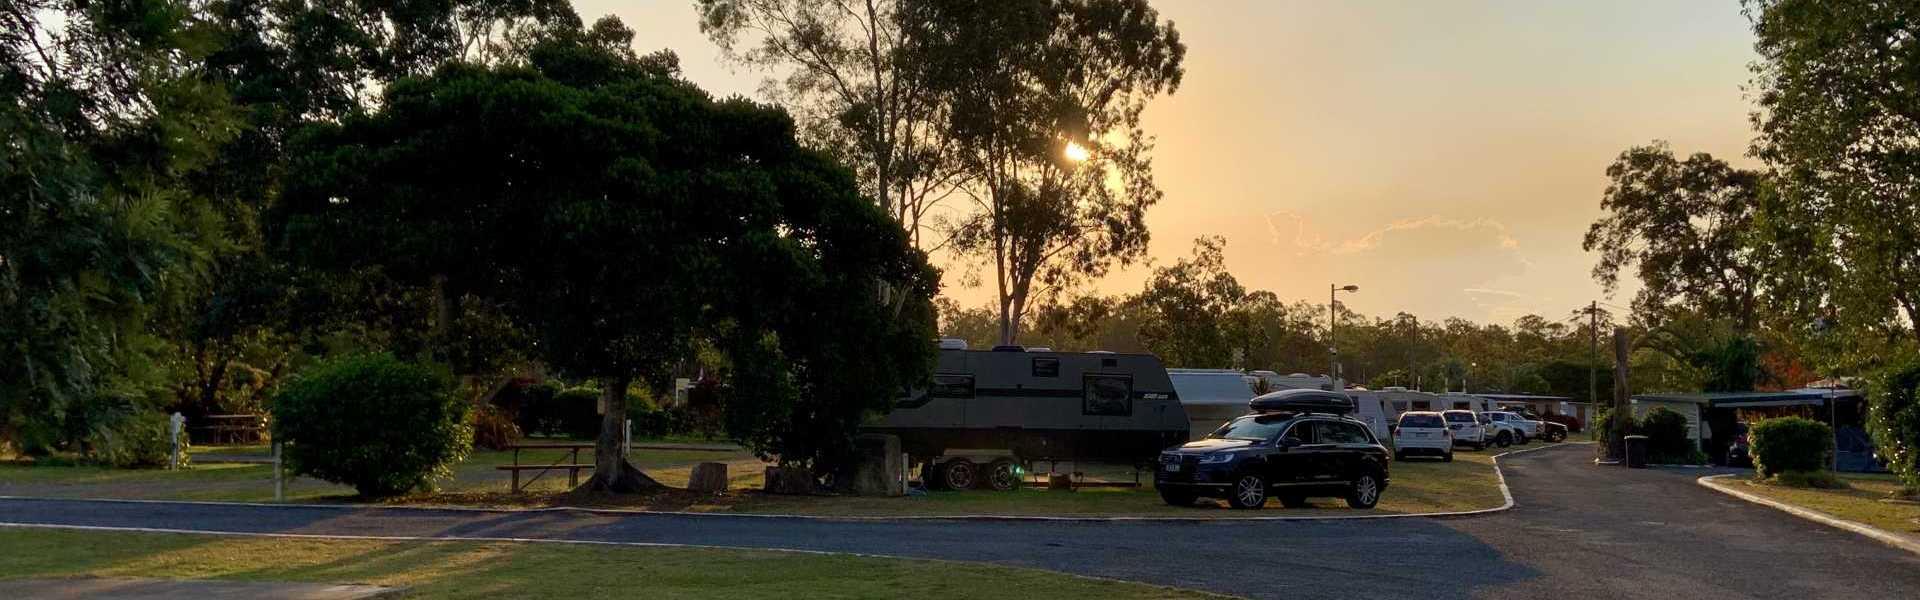 Burrum River Caravan Park Sunset